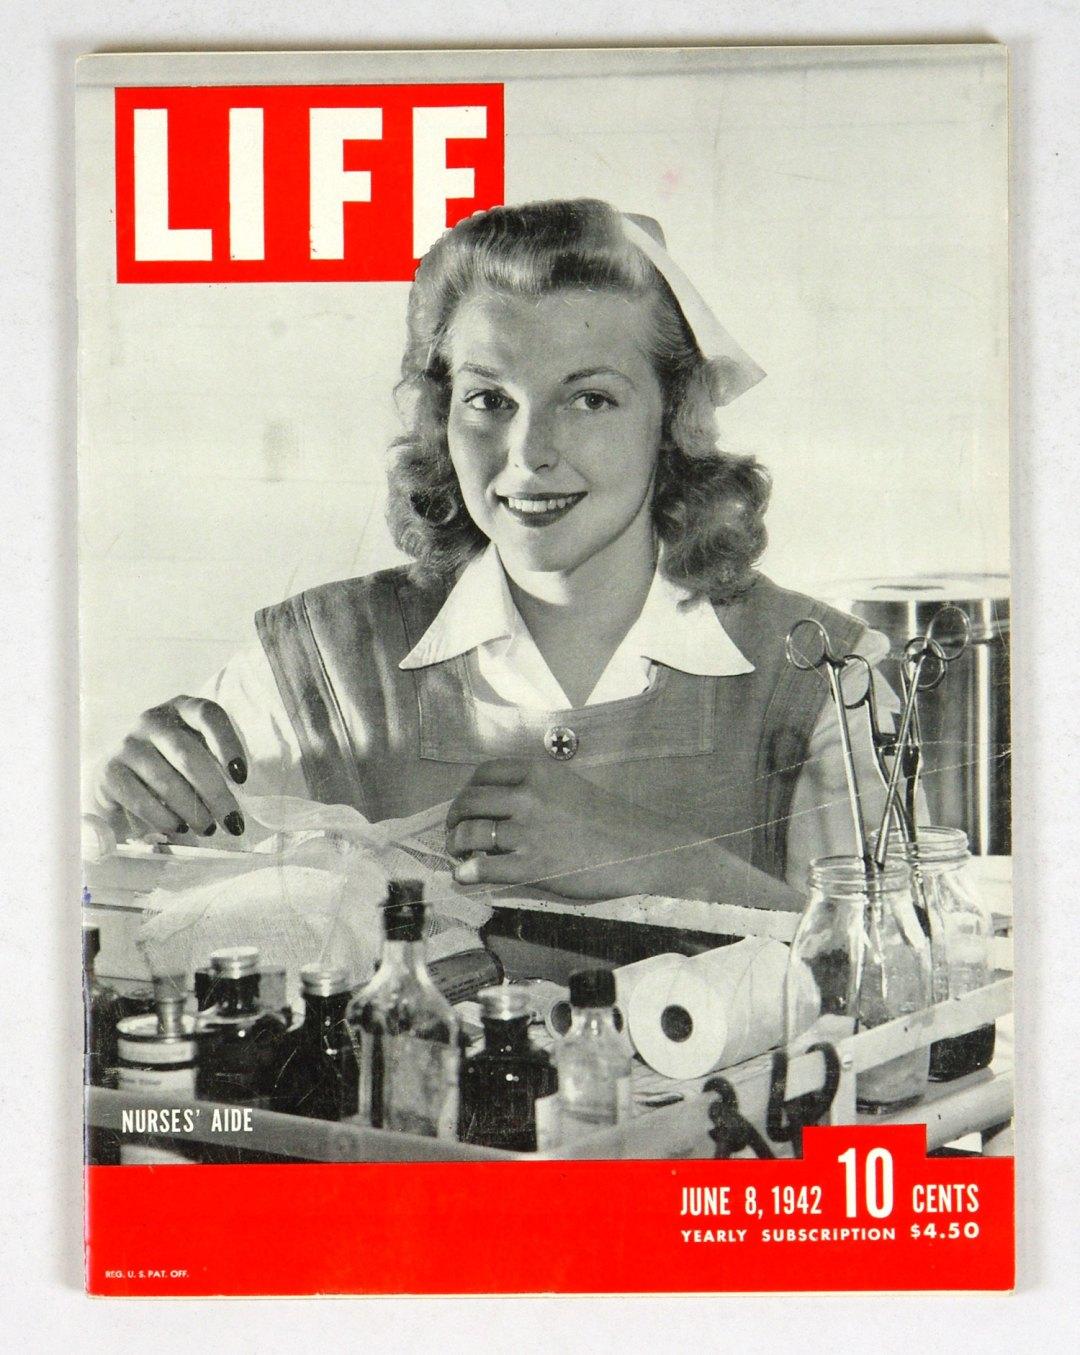 LIFE Magazine 1942 June 8 Nurses' Aide President